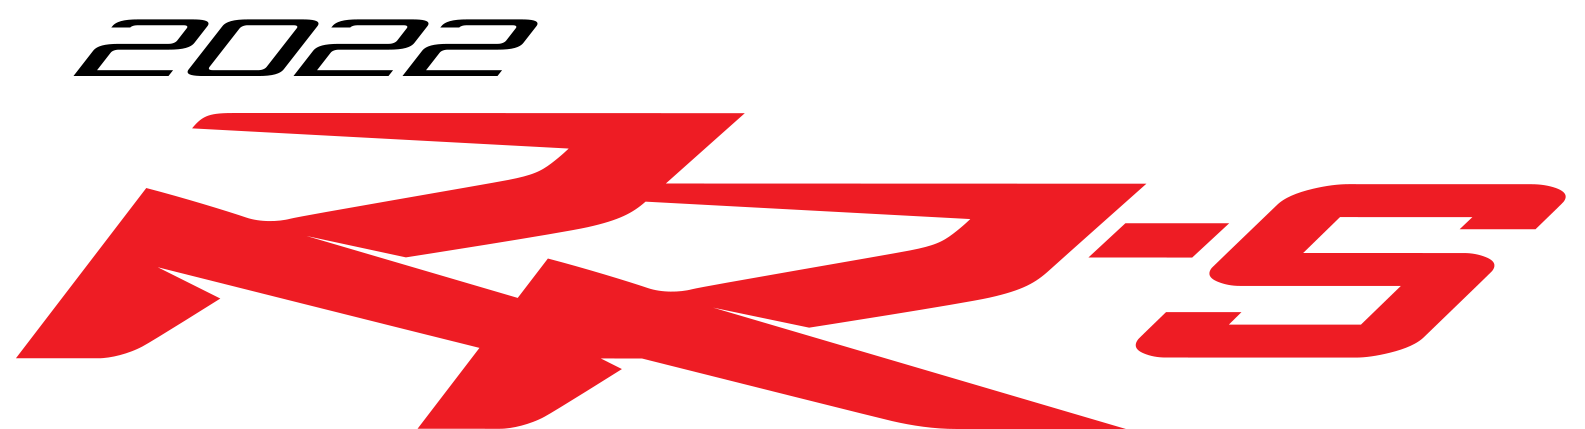 logo-rr-s-2022.png